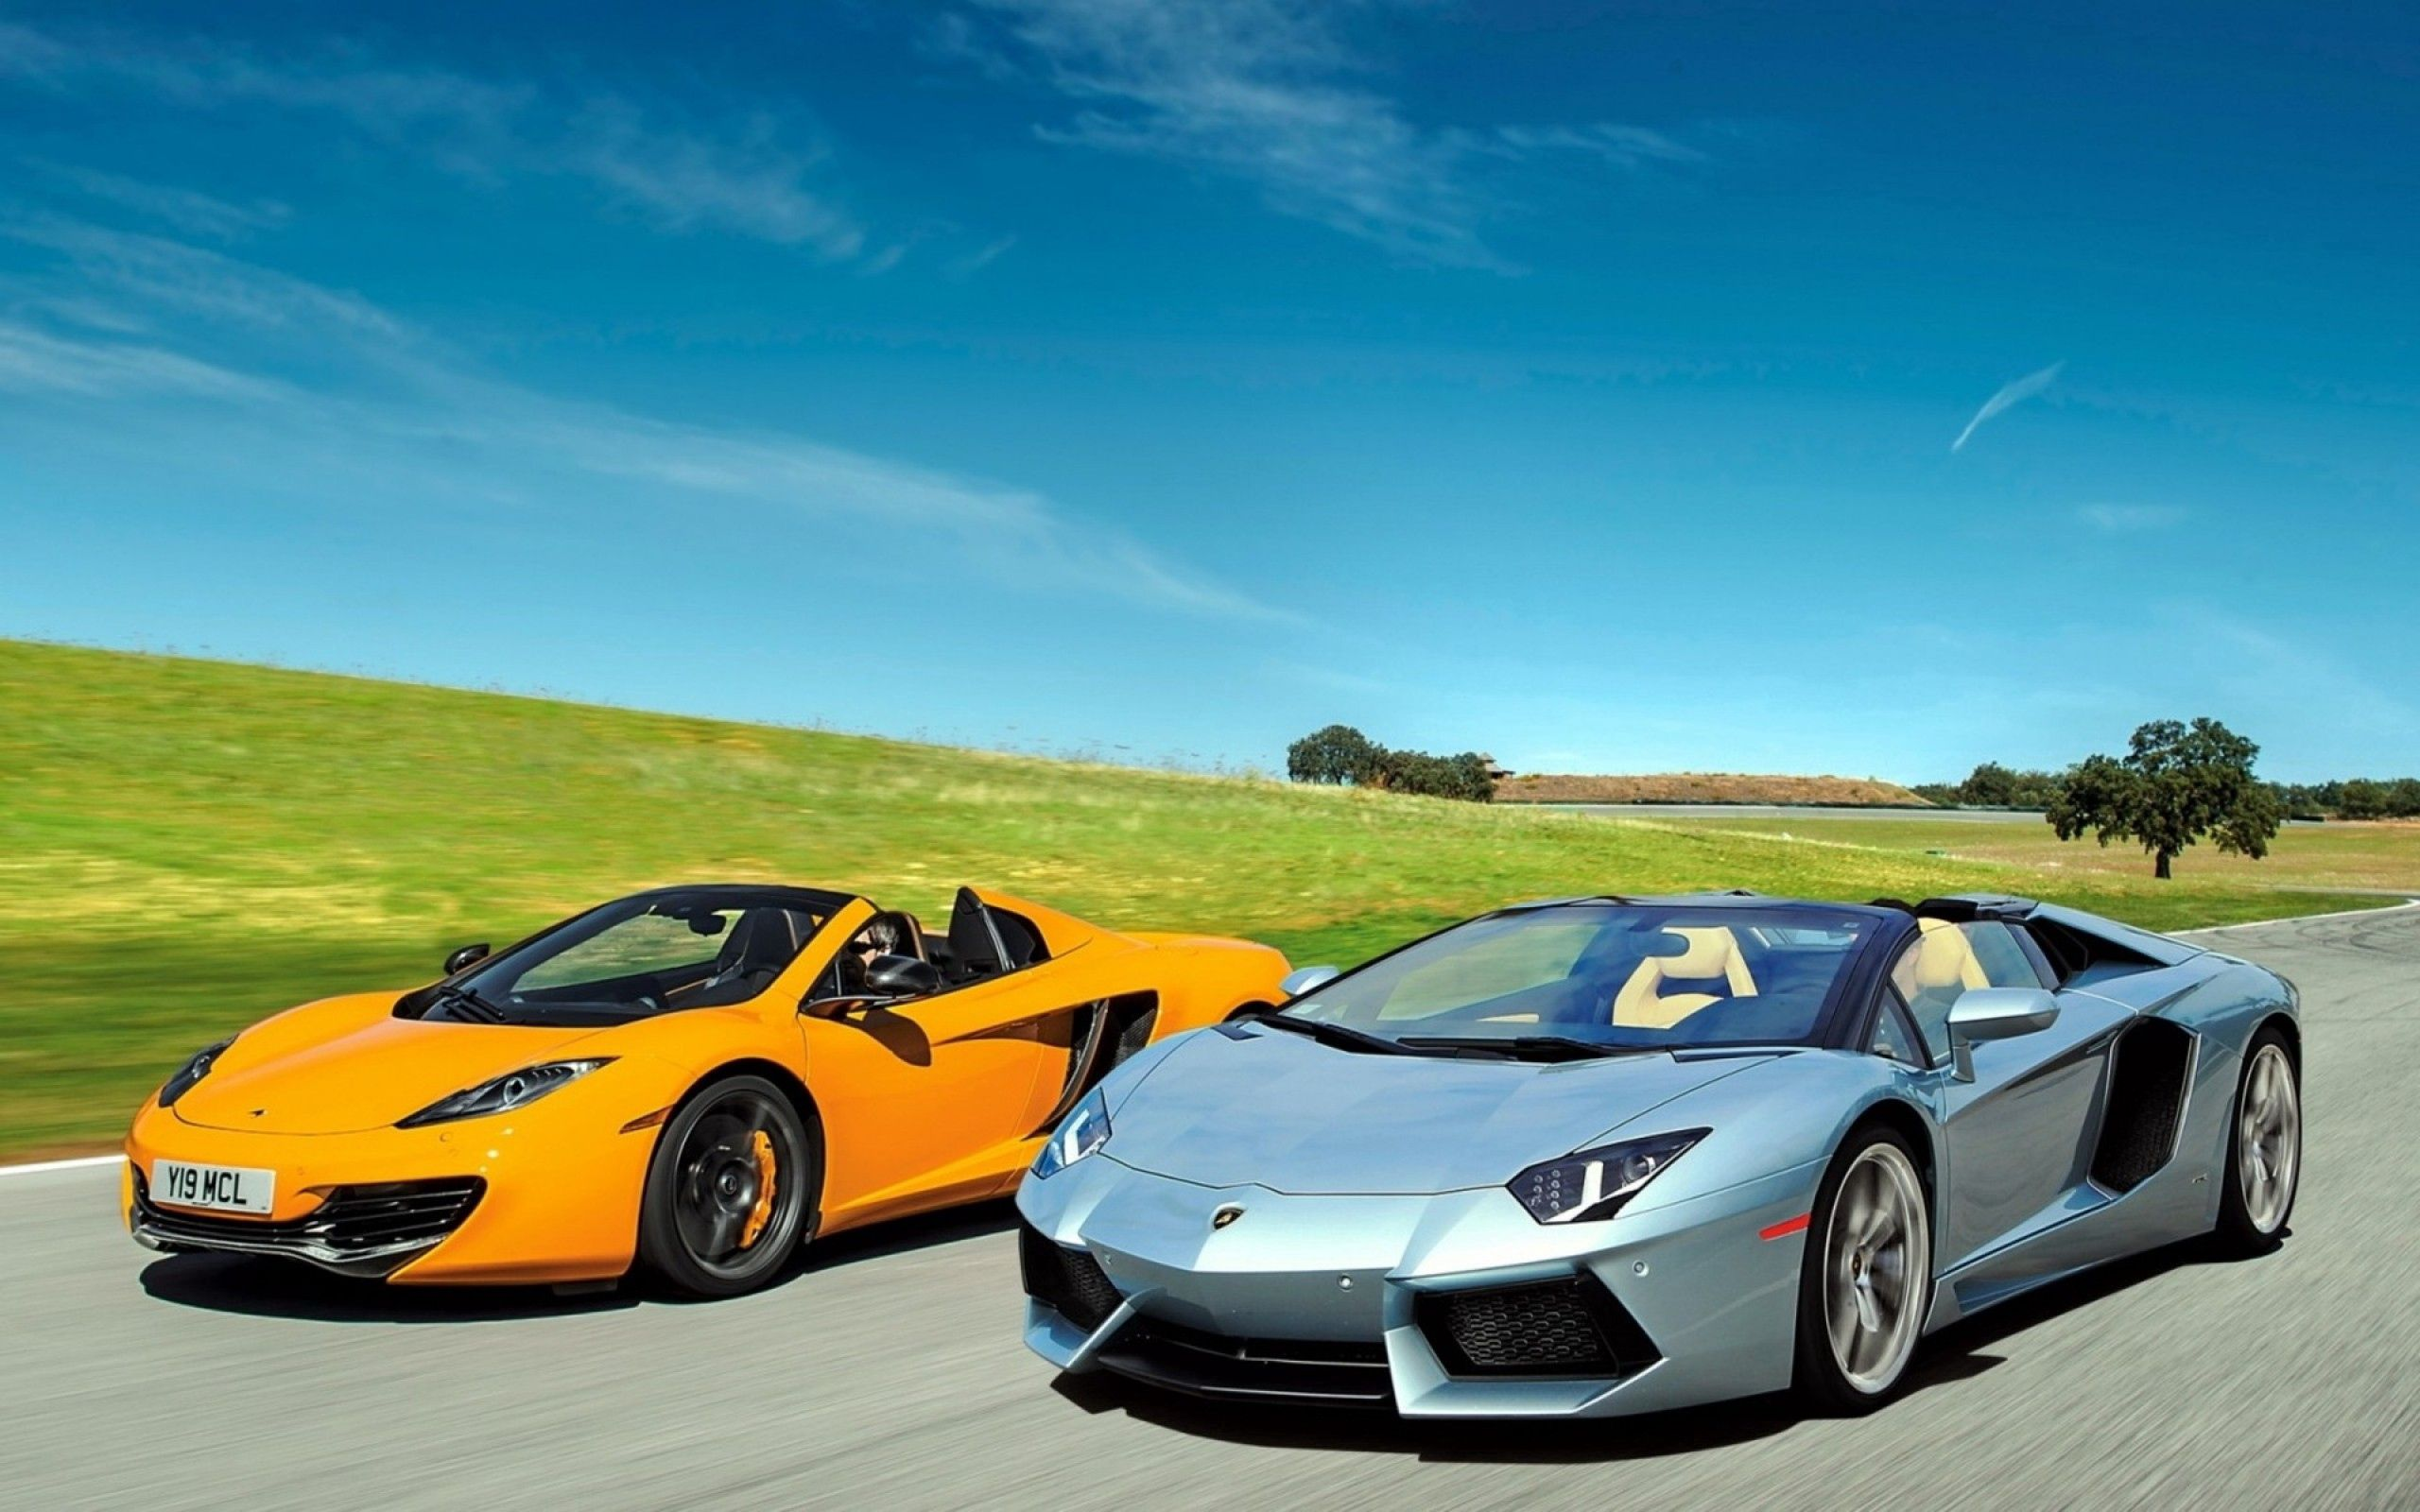 71332 download wallpaper Lamborghini, Mclaren, Cars, Mp4-12C Spider, Jootix screensavers and pictures for free